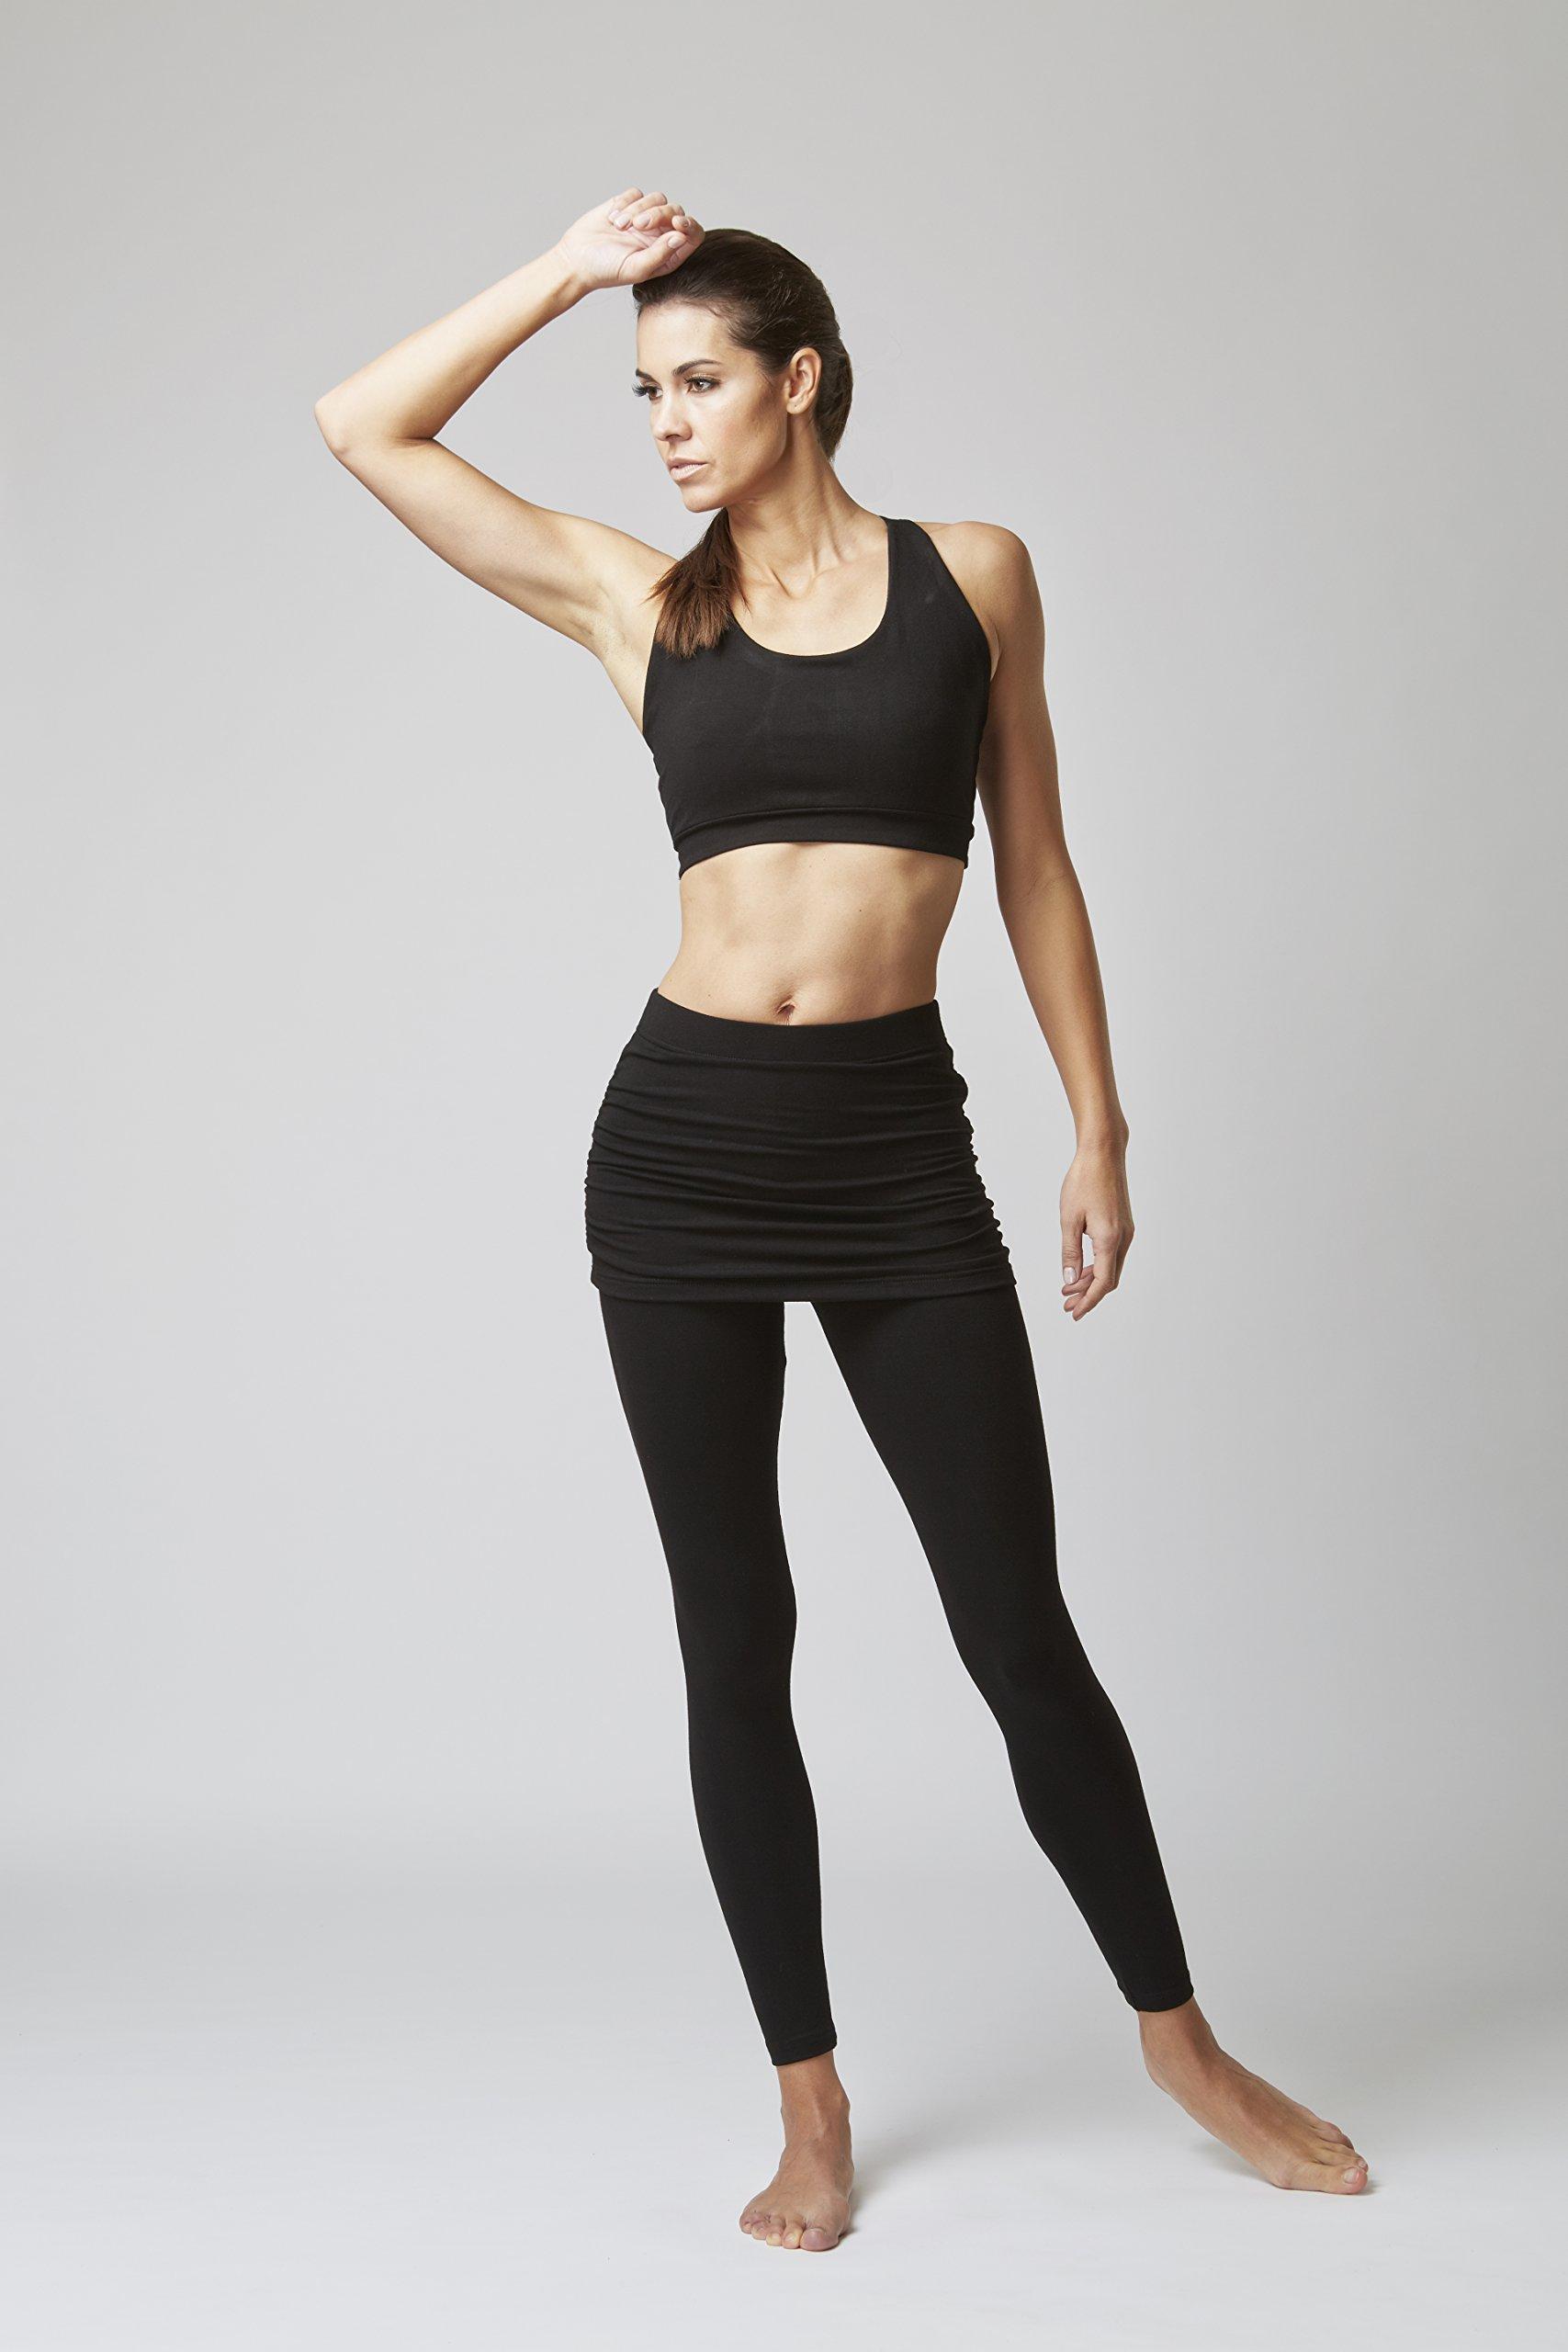 71ByaTTpmnL - TLC Sport Stay Strong Offer Women's Lightweight Waisted Gathered Skirt Leggings Black